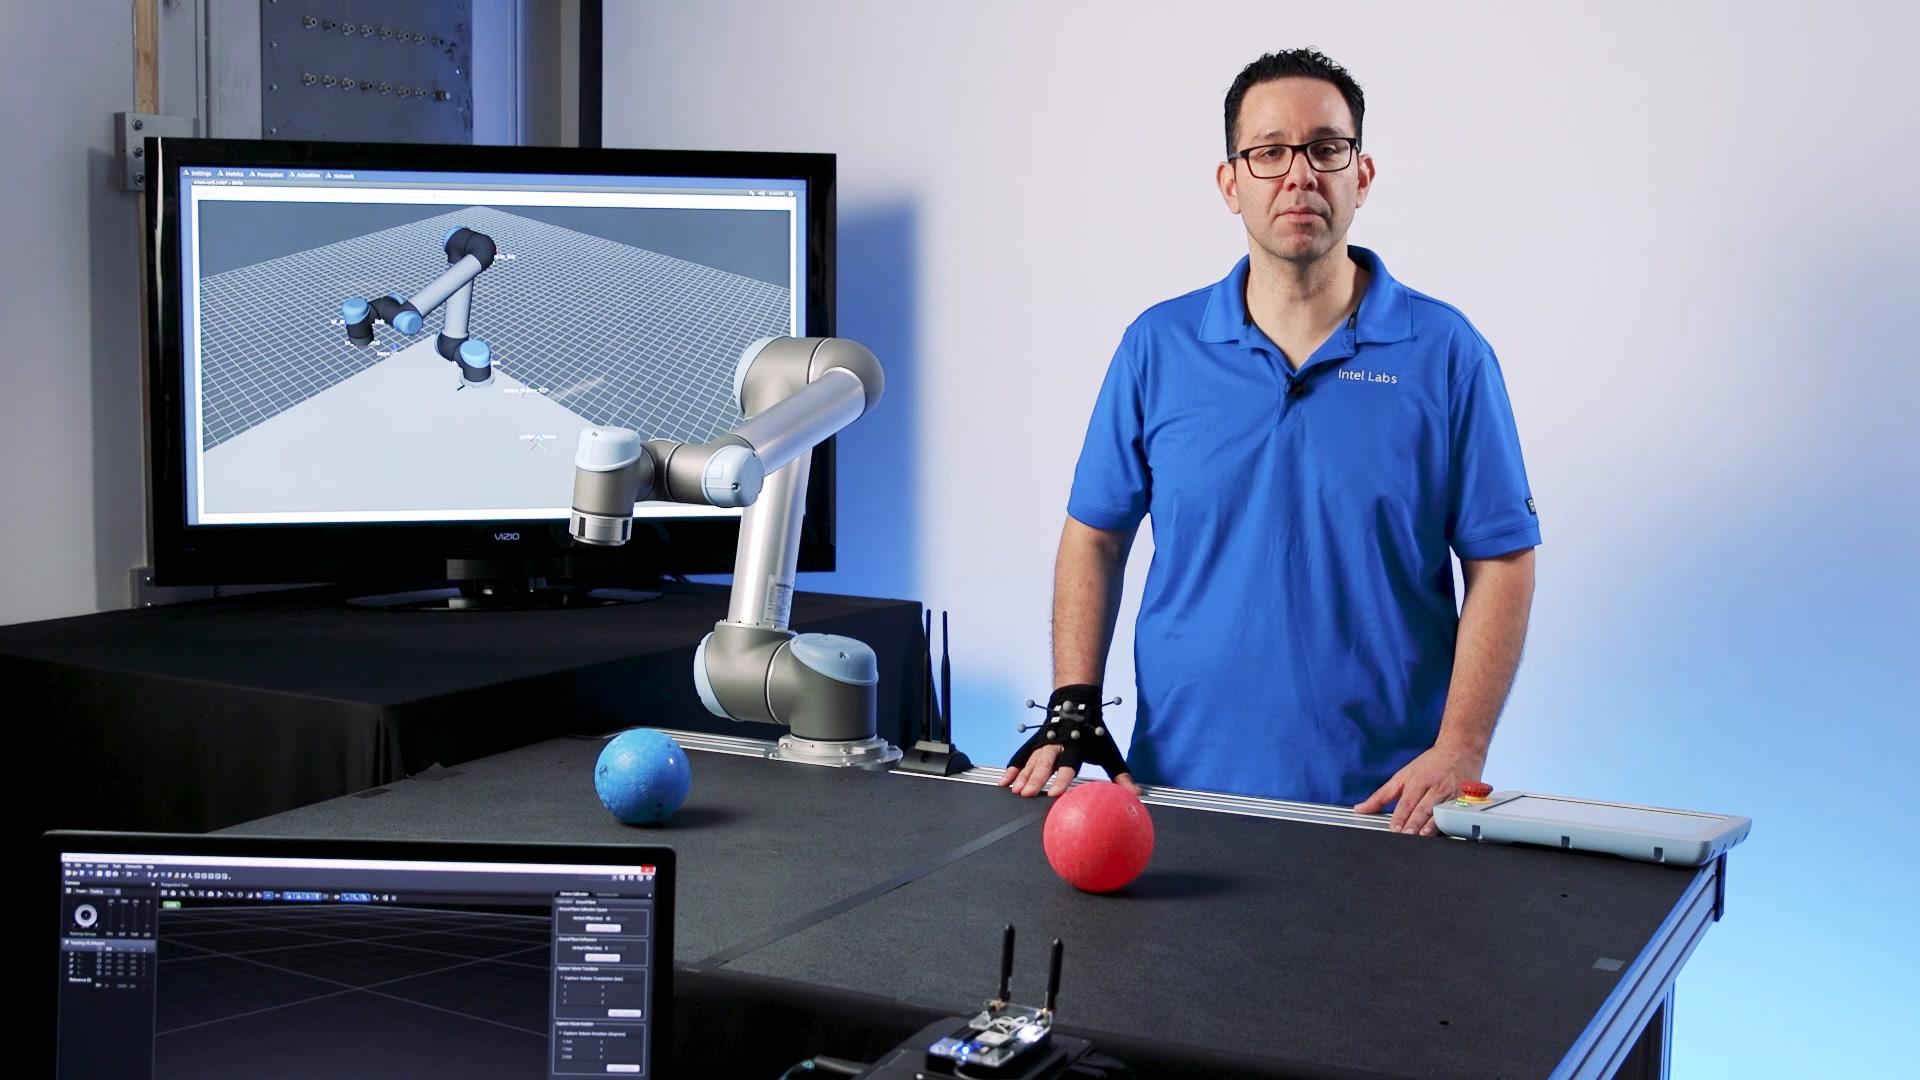 Chapter 1: Intel Labs Wireless Robotics Demonstration